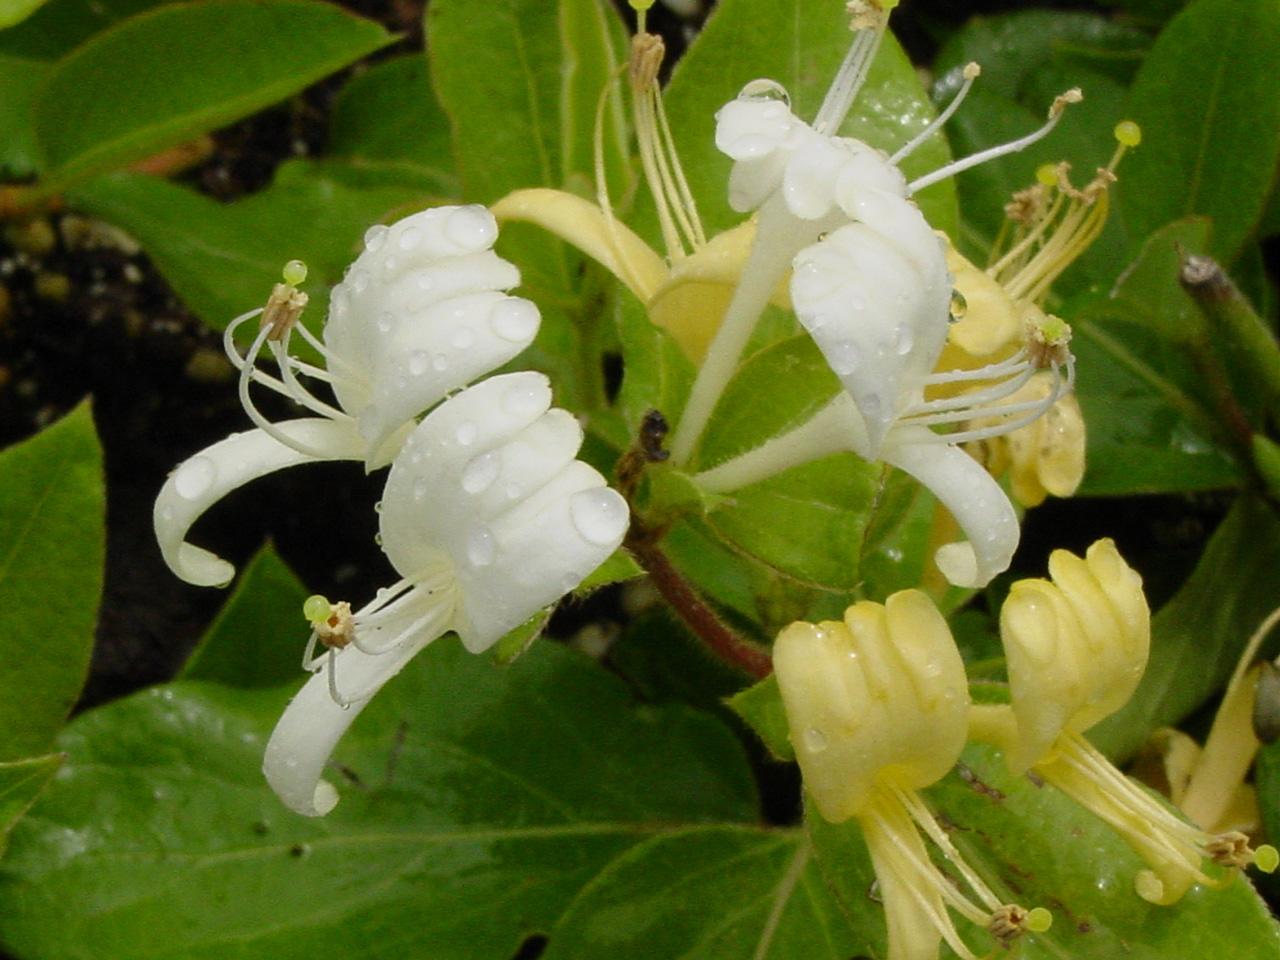 Pure white flowers dlt growers honeysuckle mightylinksfo